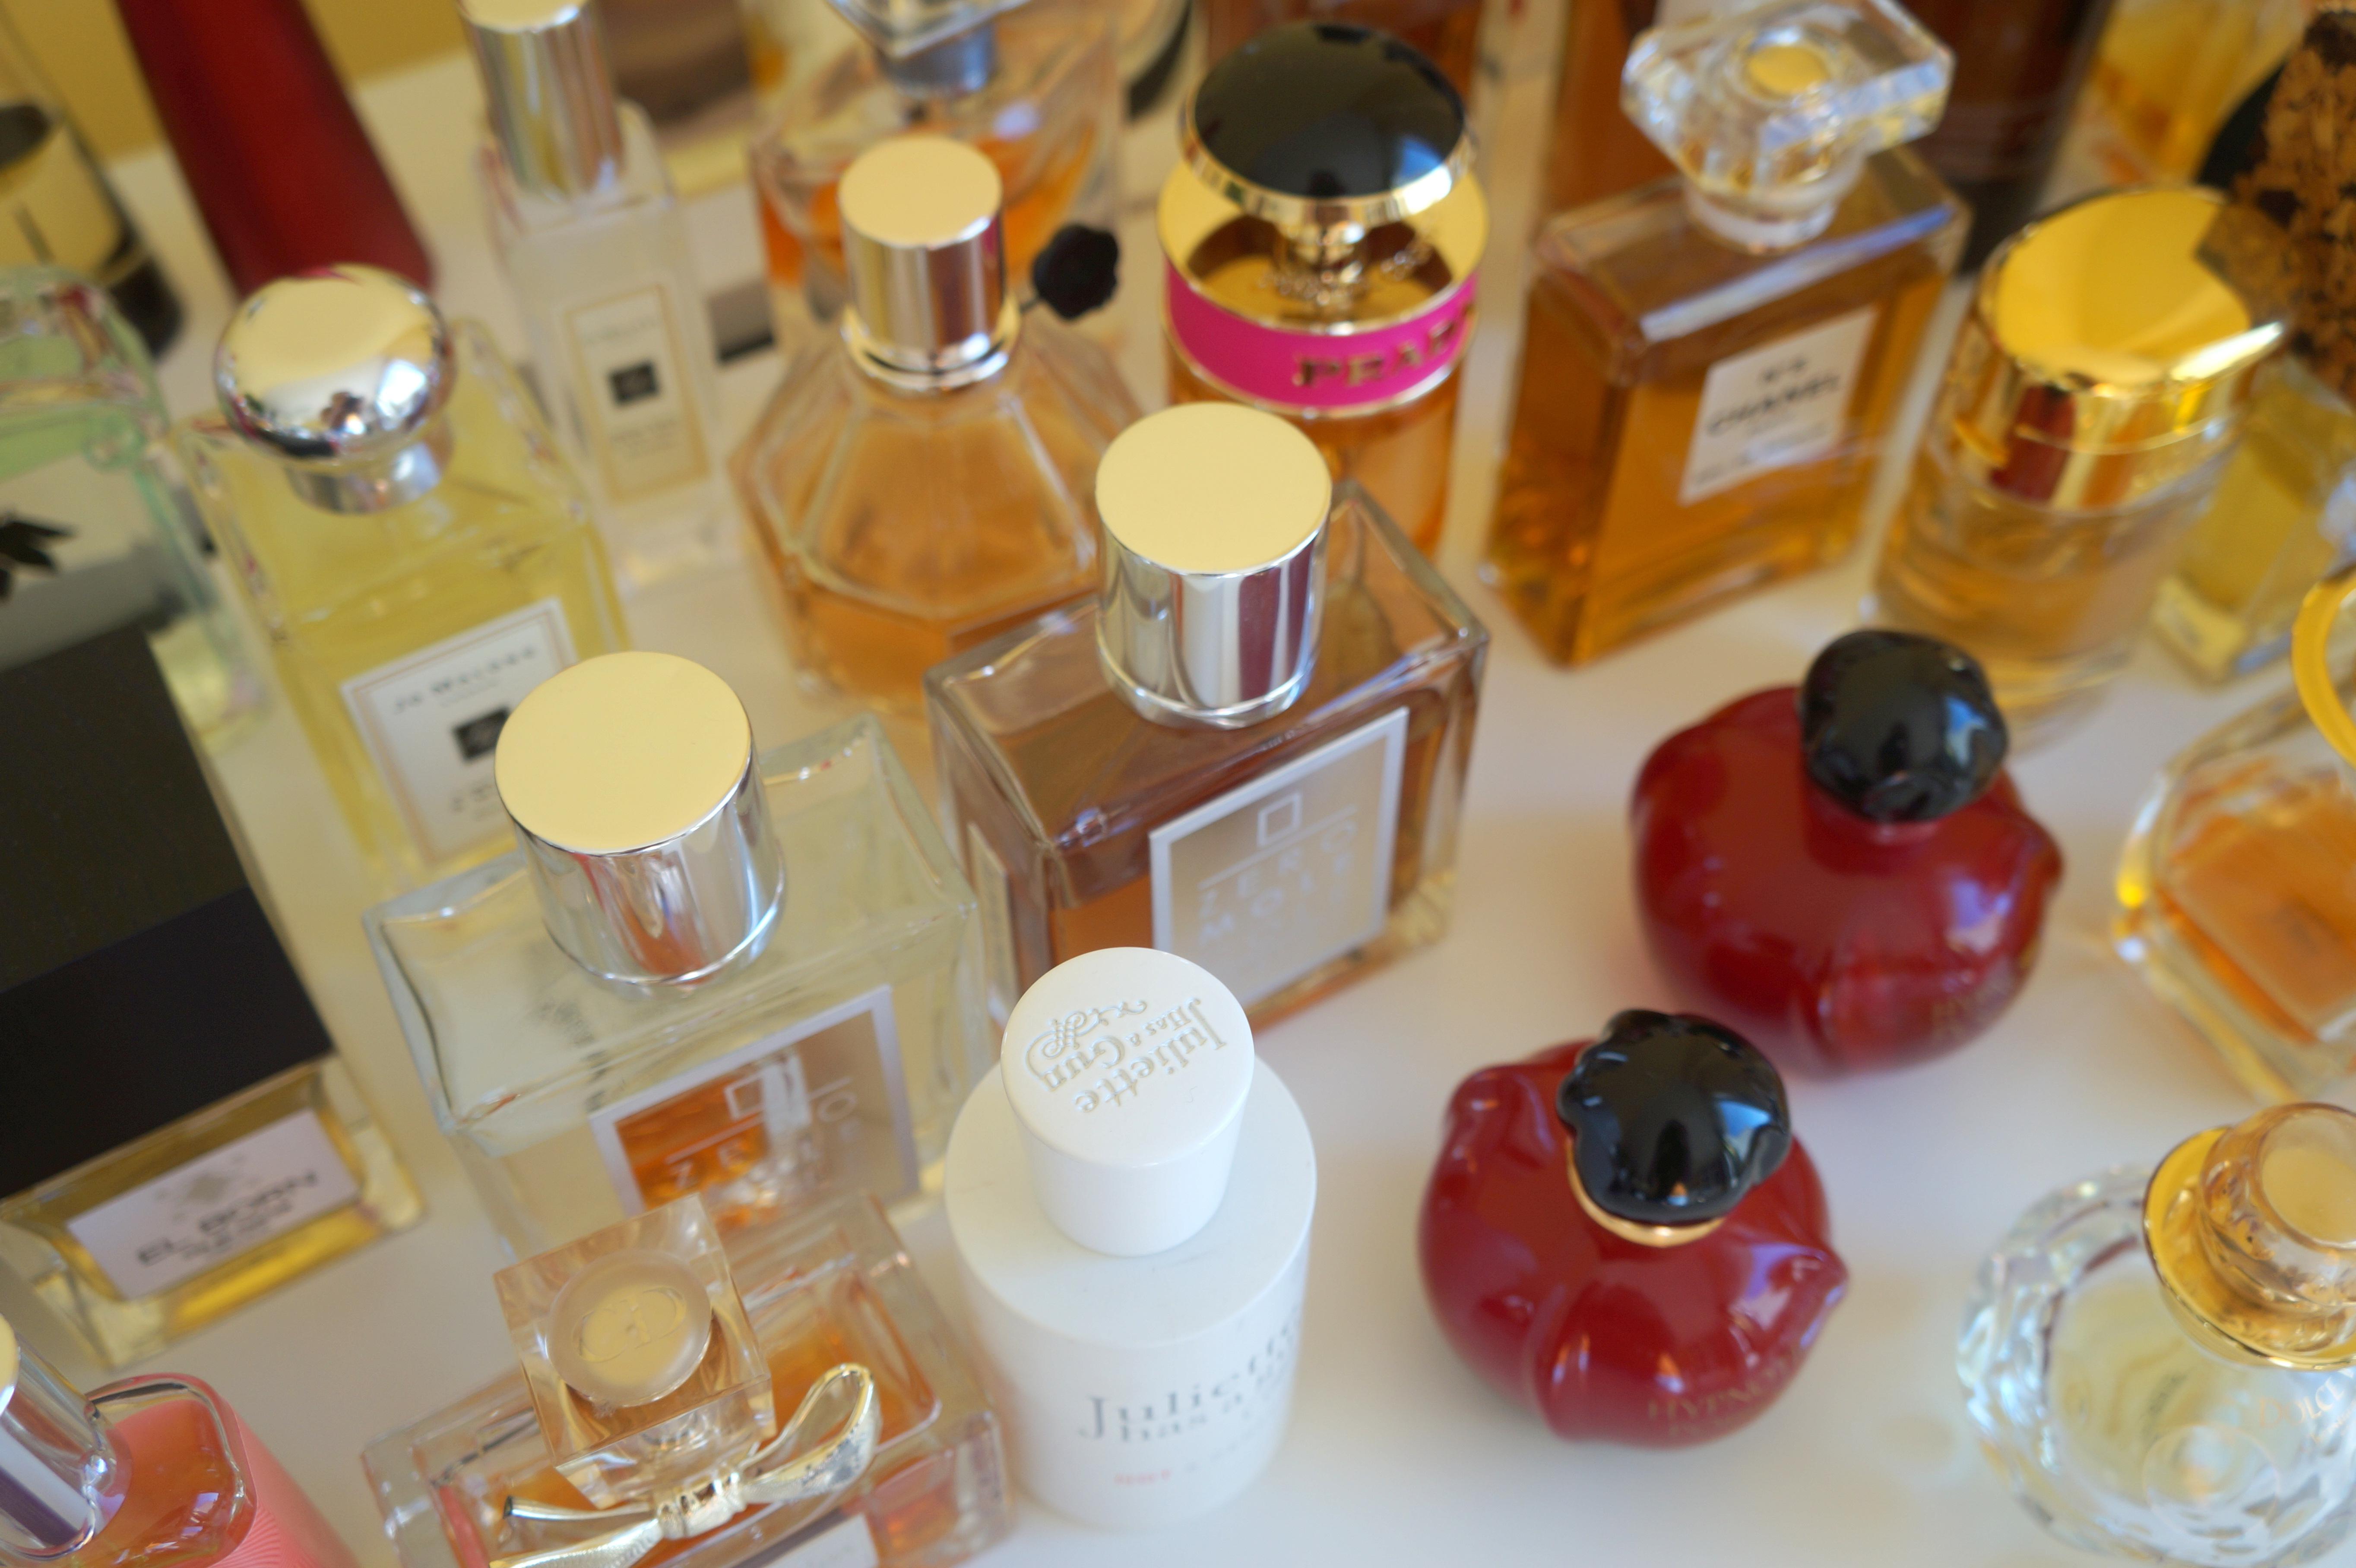 Moja kolekcja perfum front